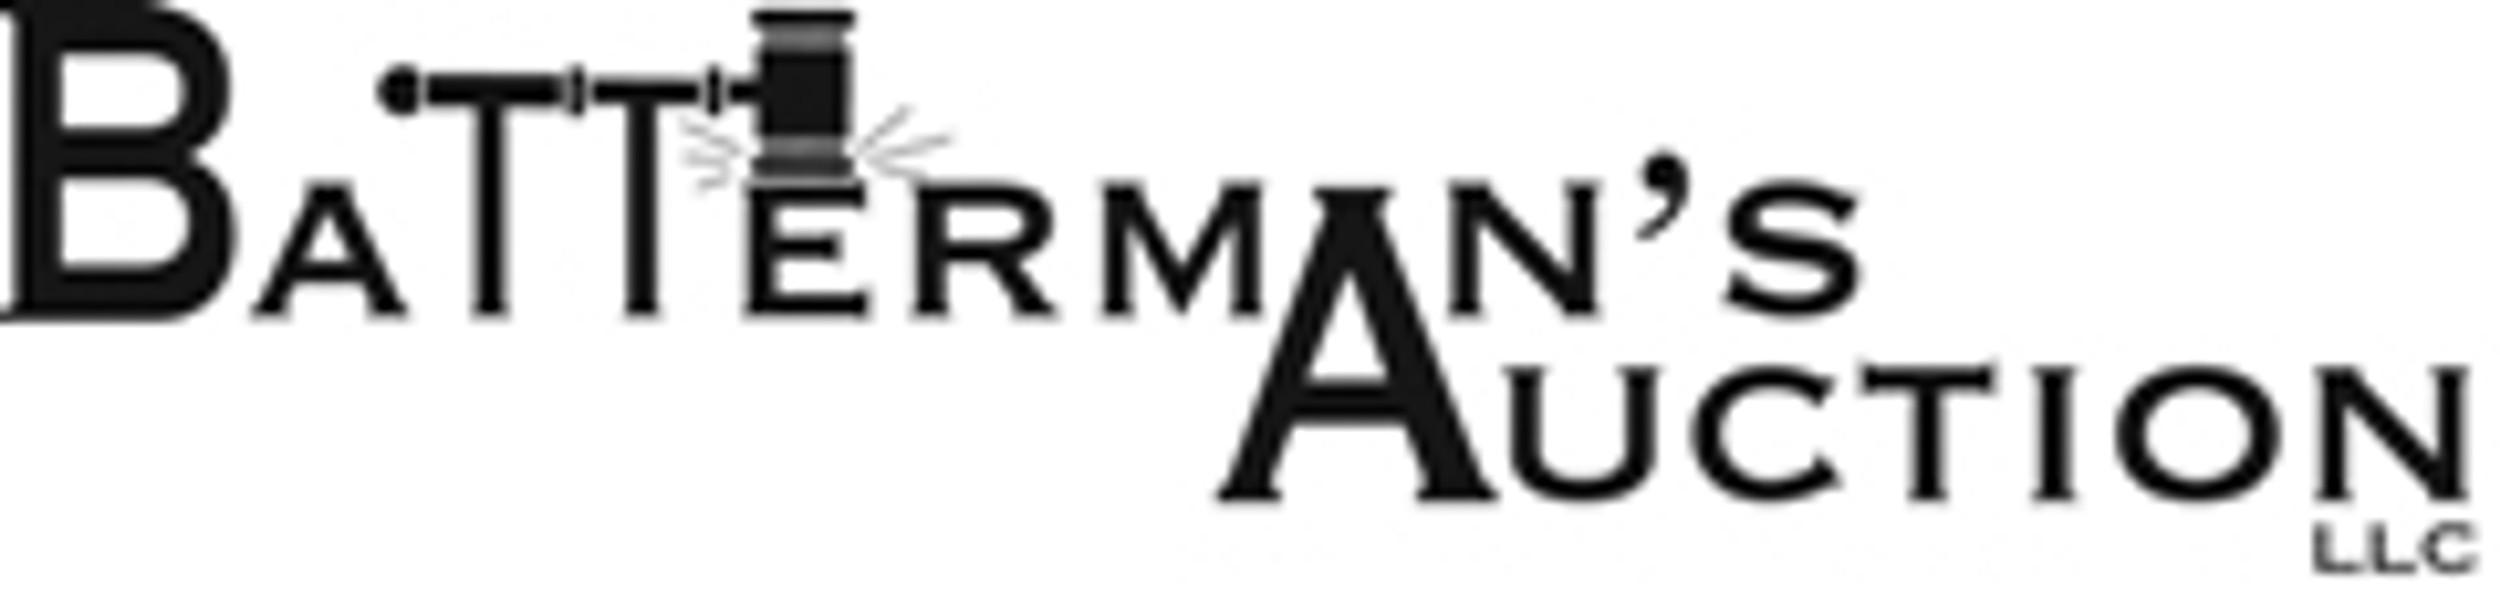 Batterman's Auction LLC logo